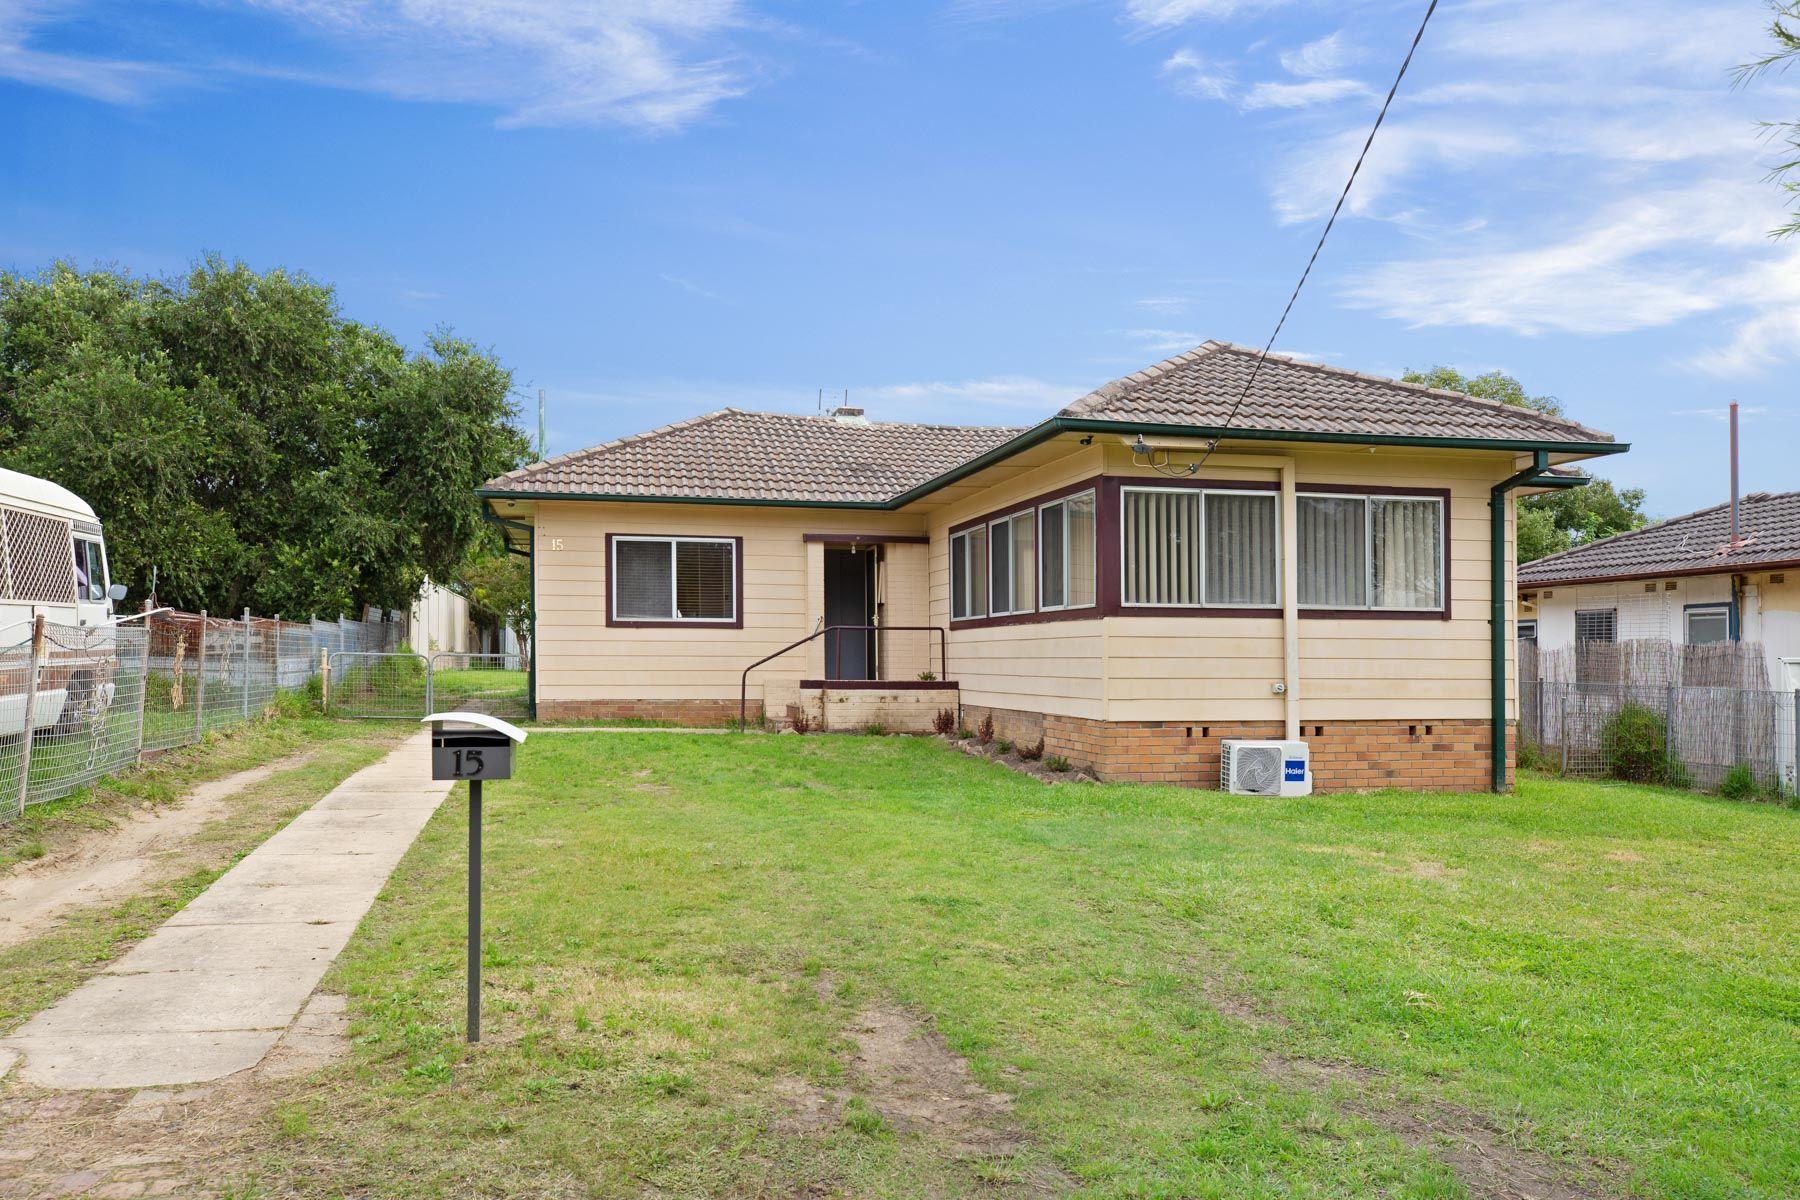 15 Piper Street, Argenton, NSW 2284